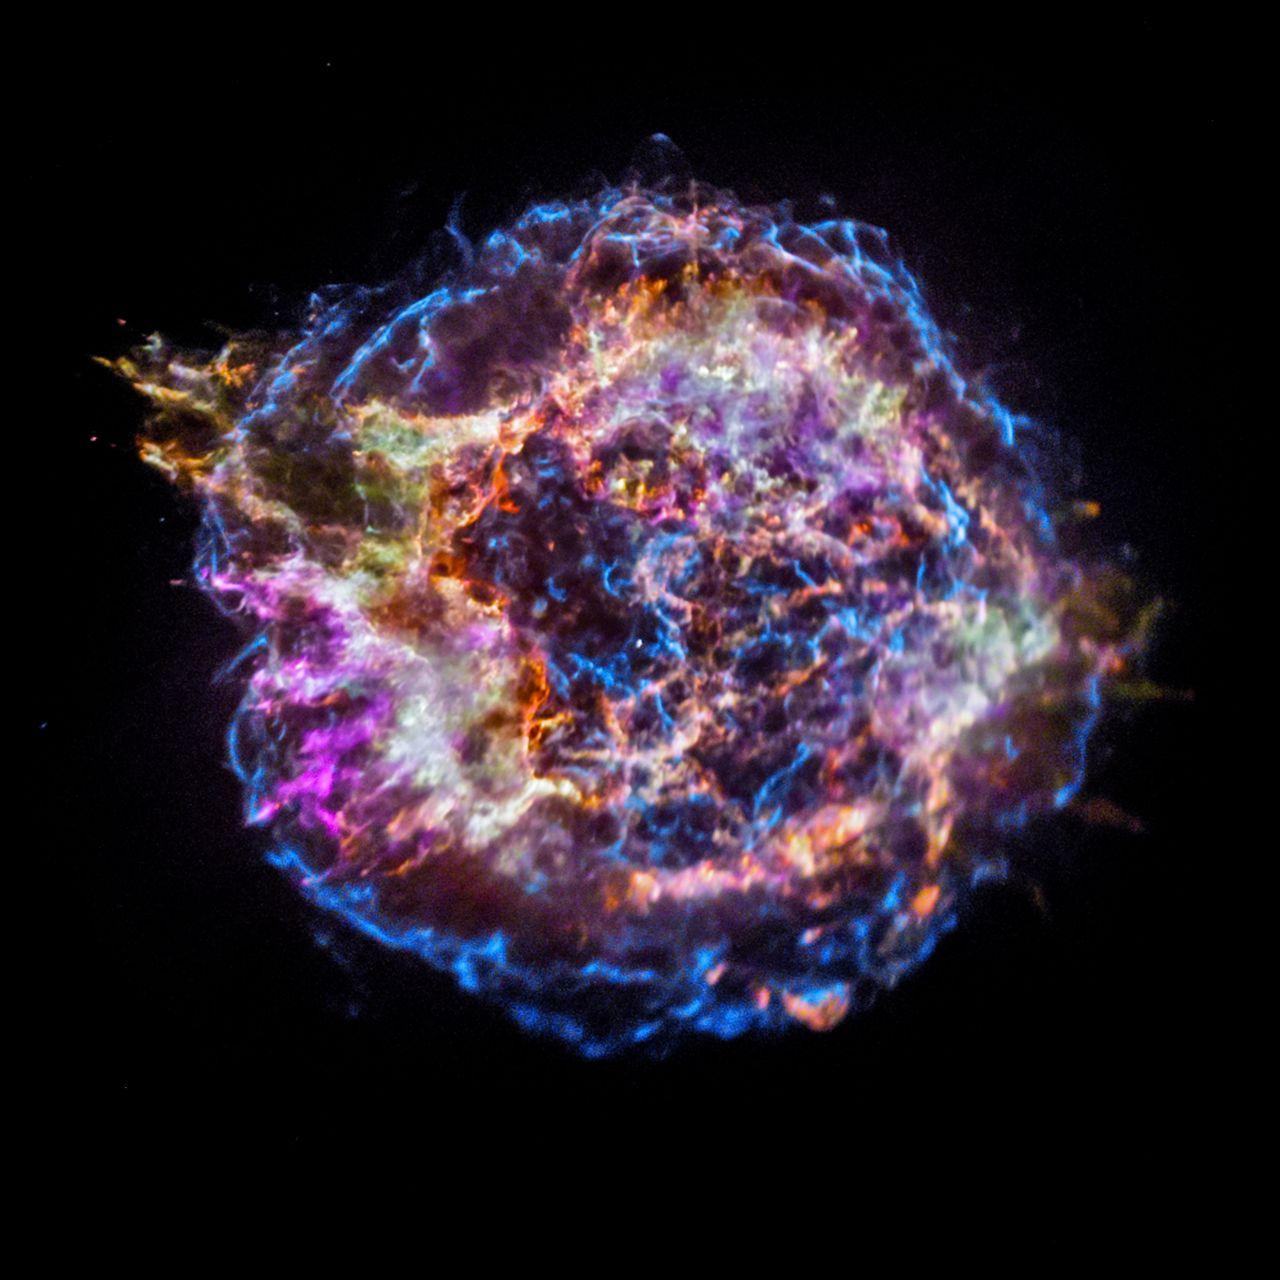 Die Reste der Supernova Cassiopeia A